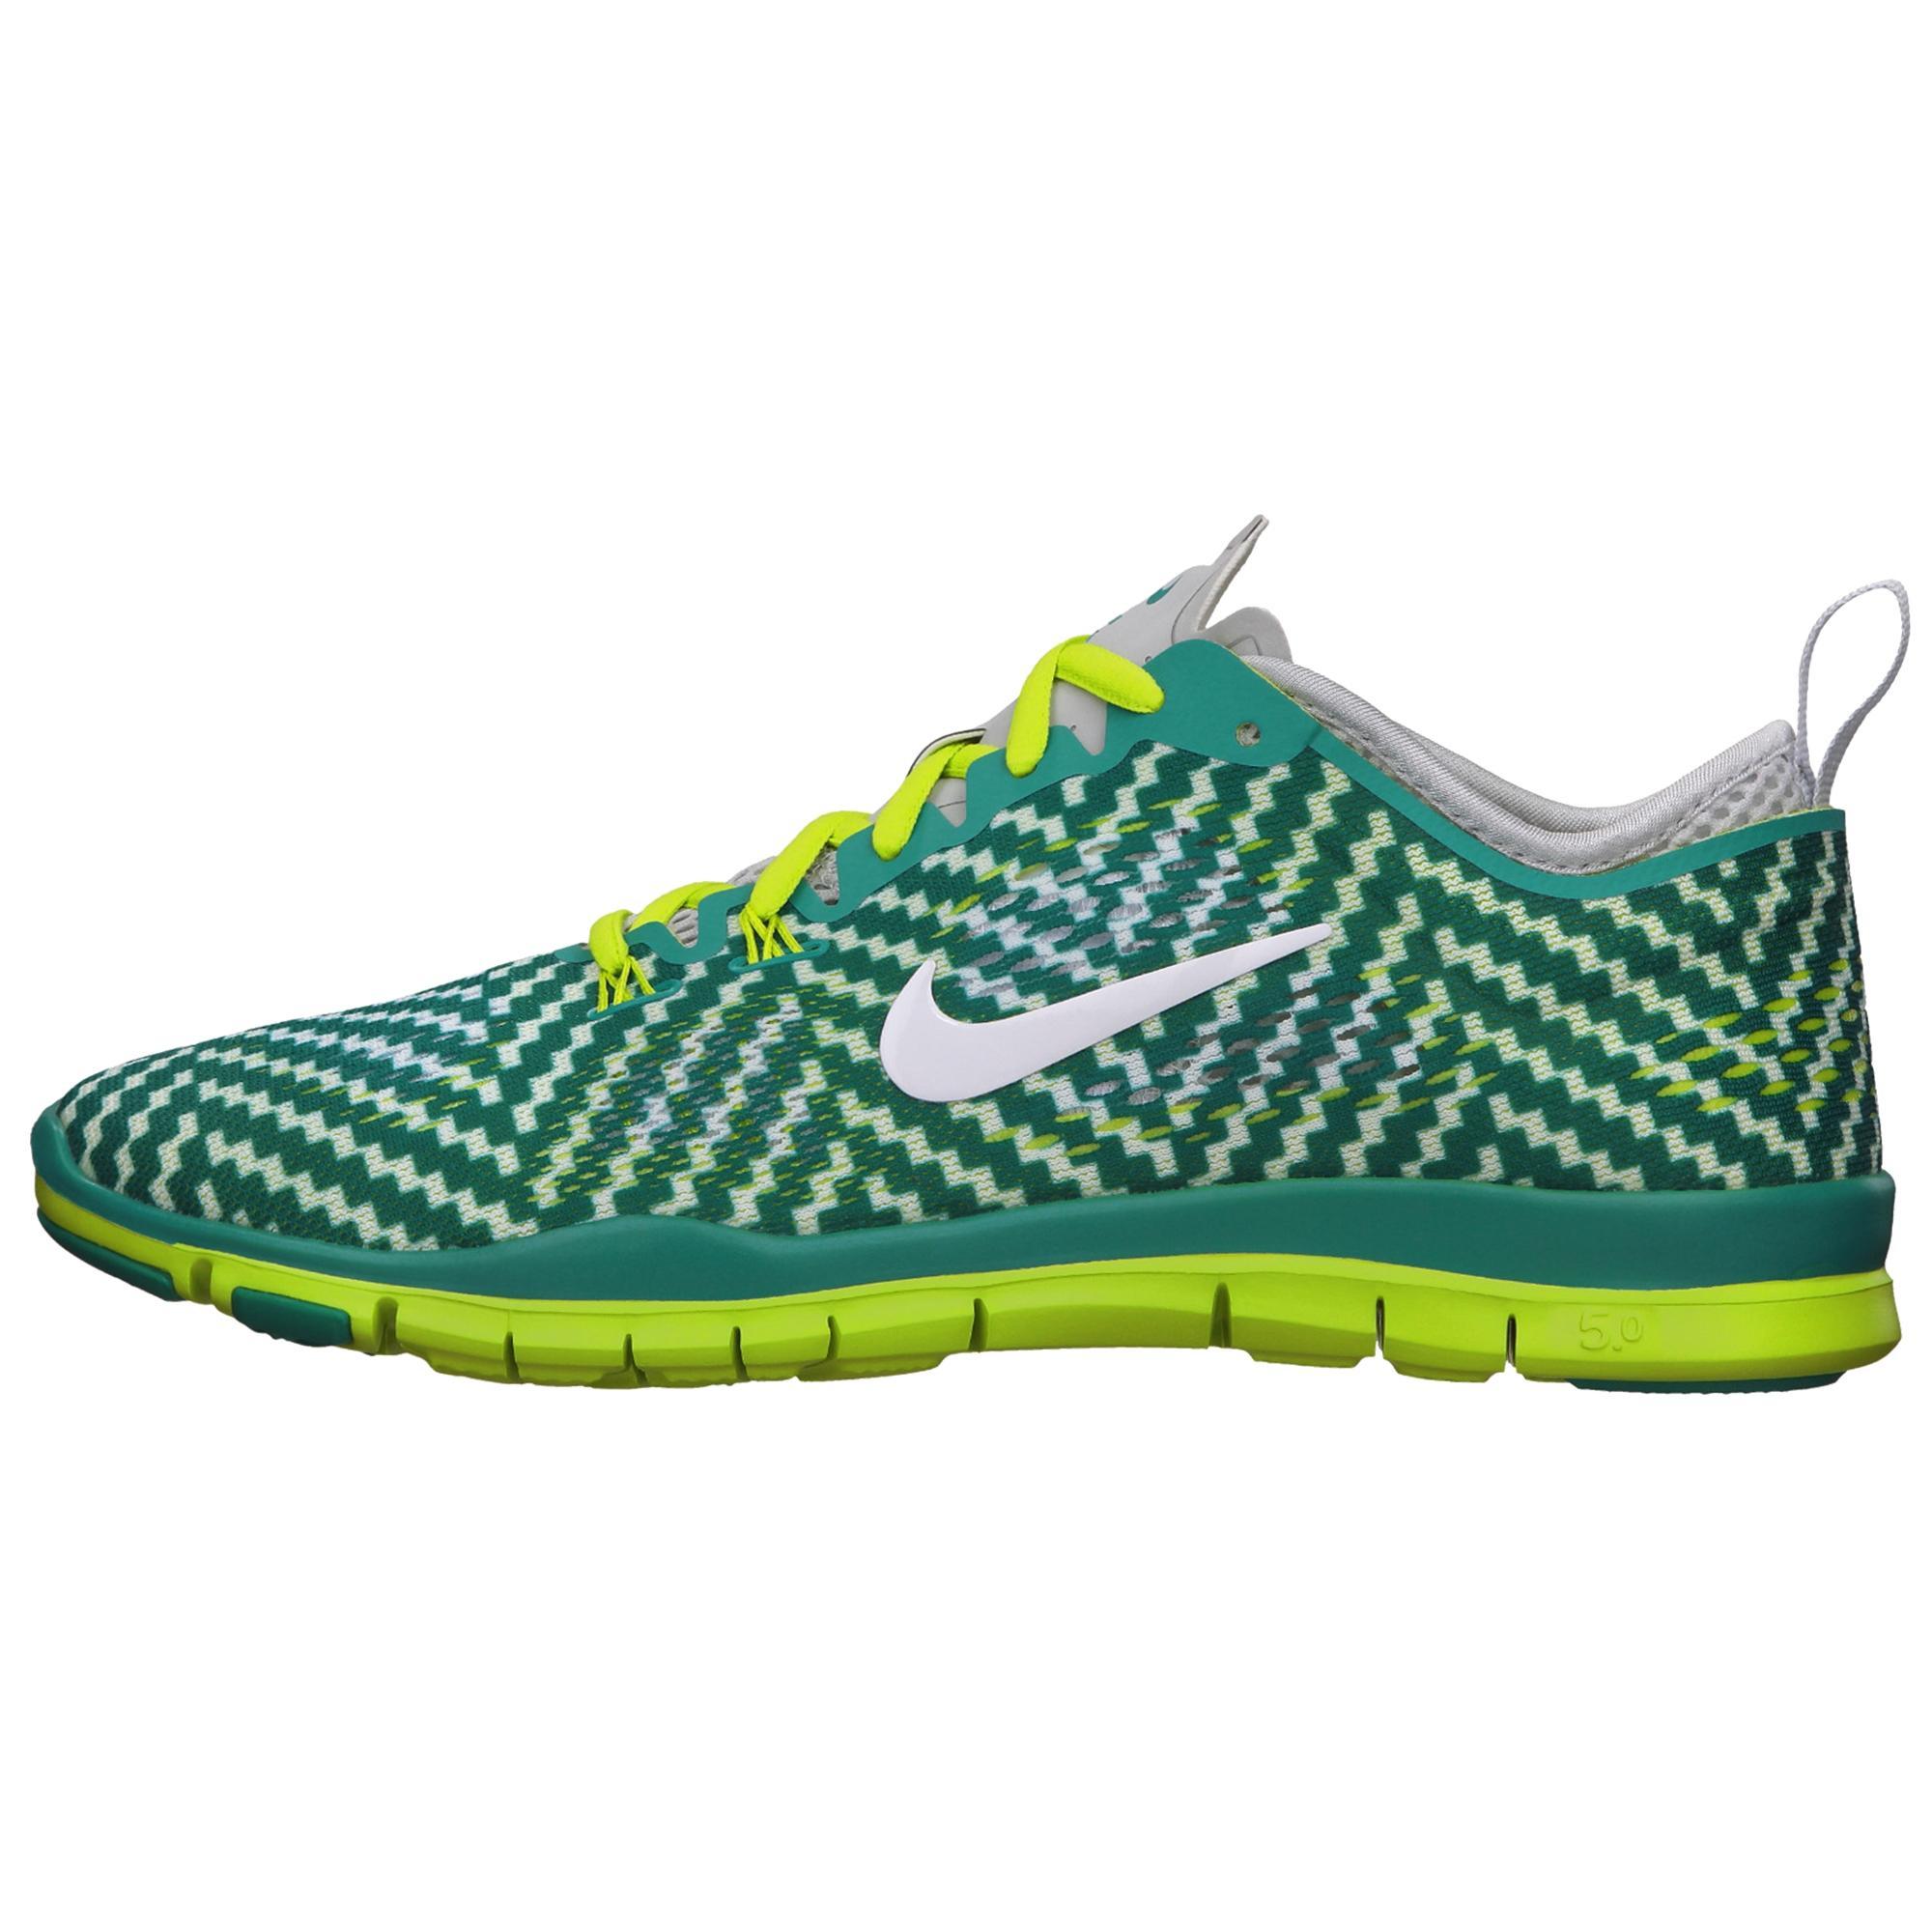 6c8597d859f ... SKU  8255349 - YouTube  Nike Free 5 0 Tr Fit 4 Print Training Shoe  Women Shop It ..